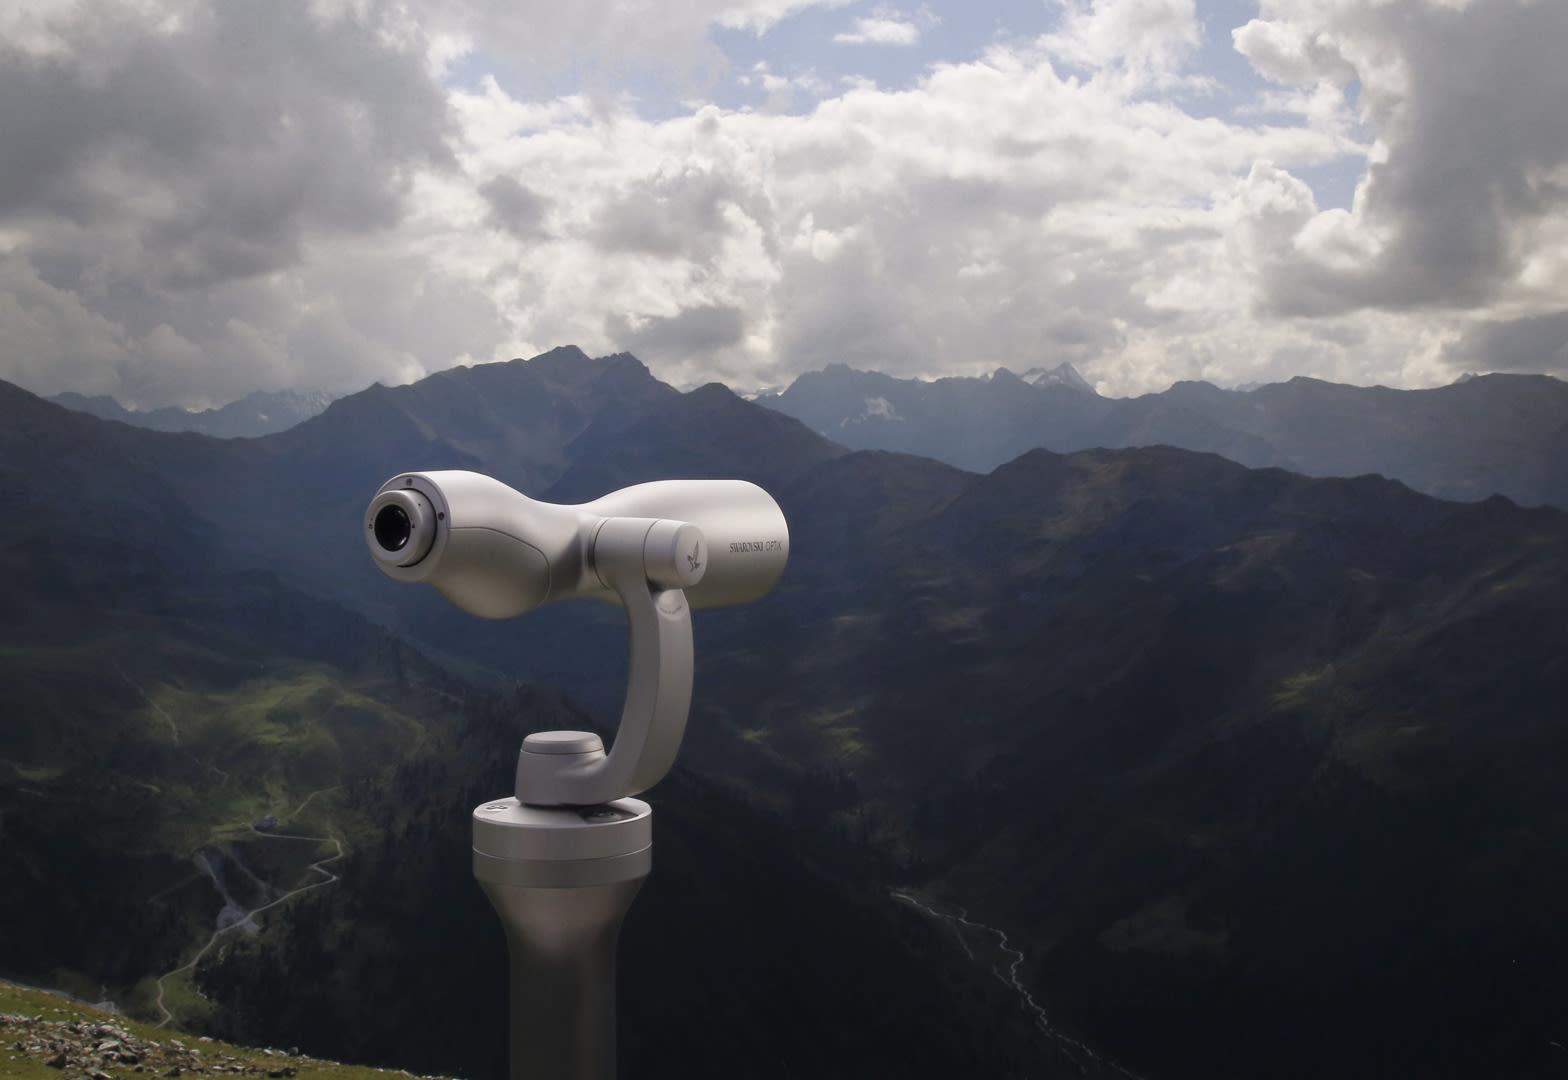 STVista outdoor spotting scope AxamerLizum ID 1243621